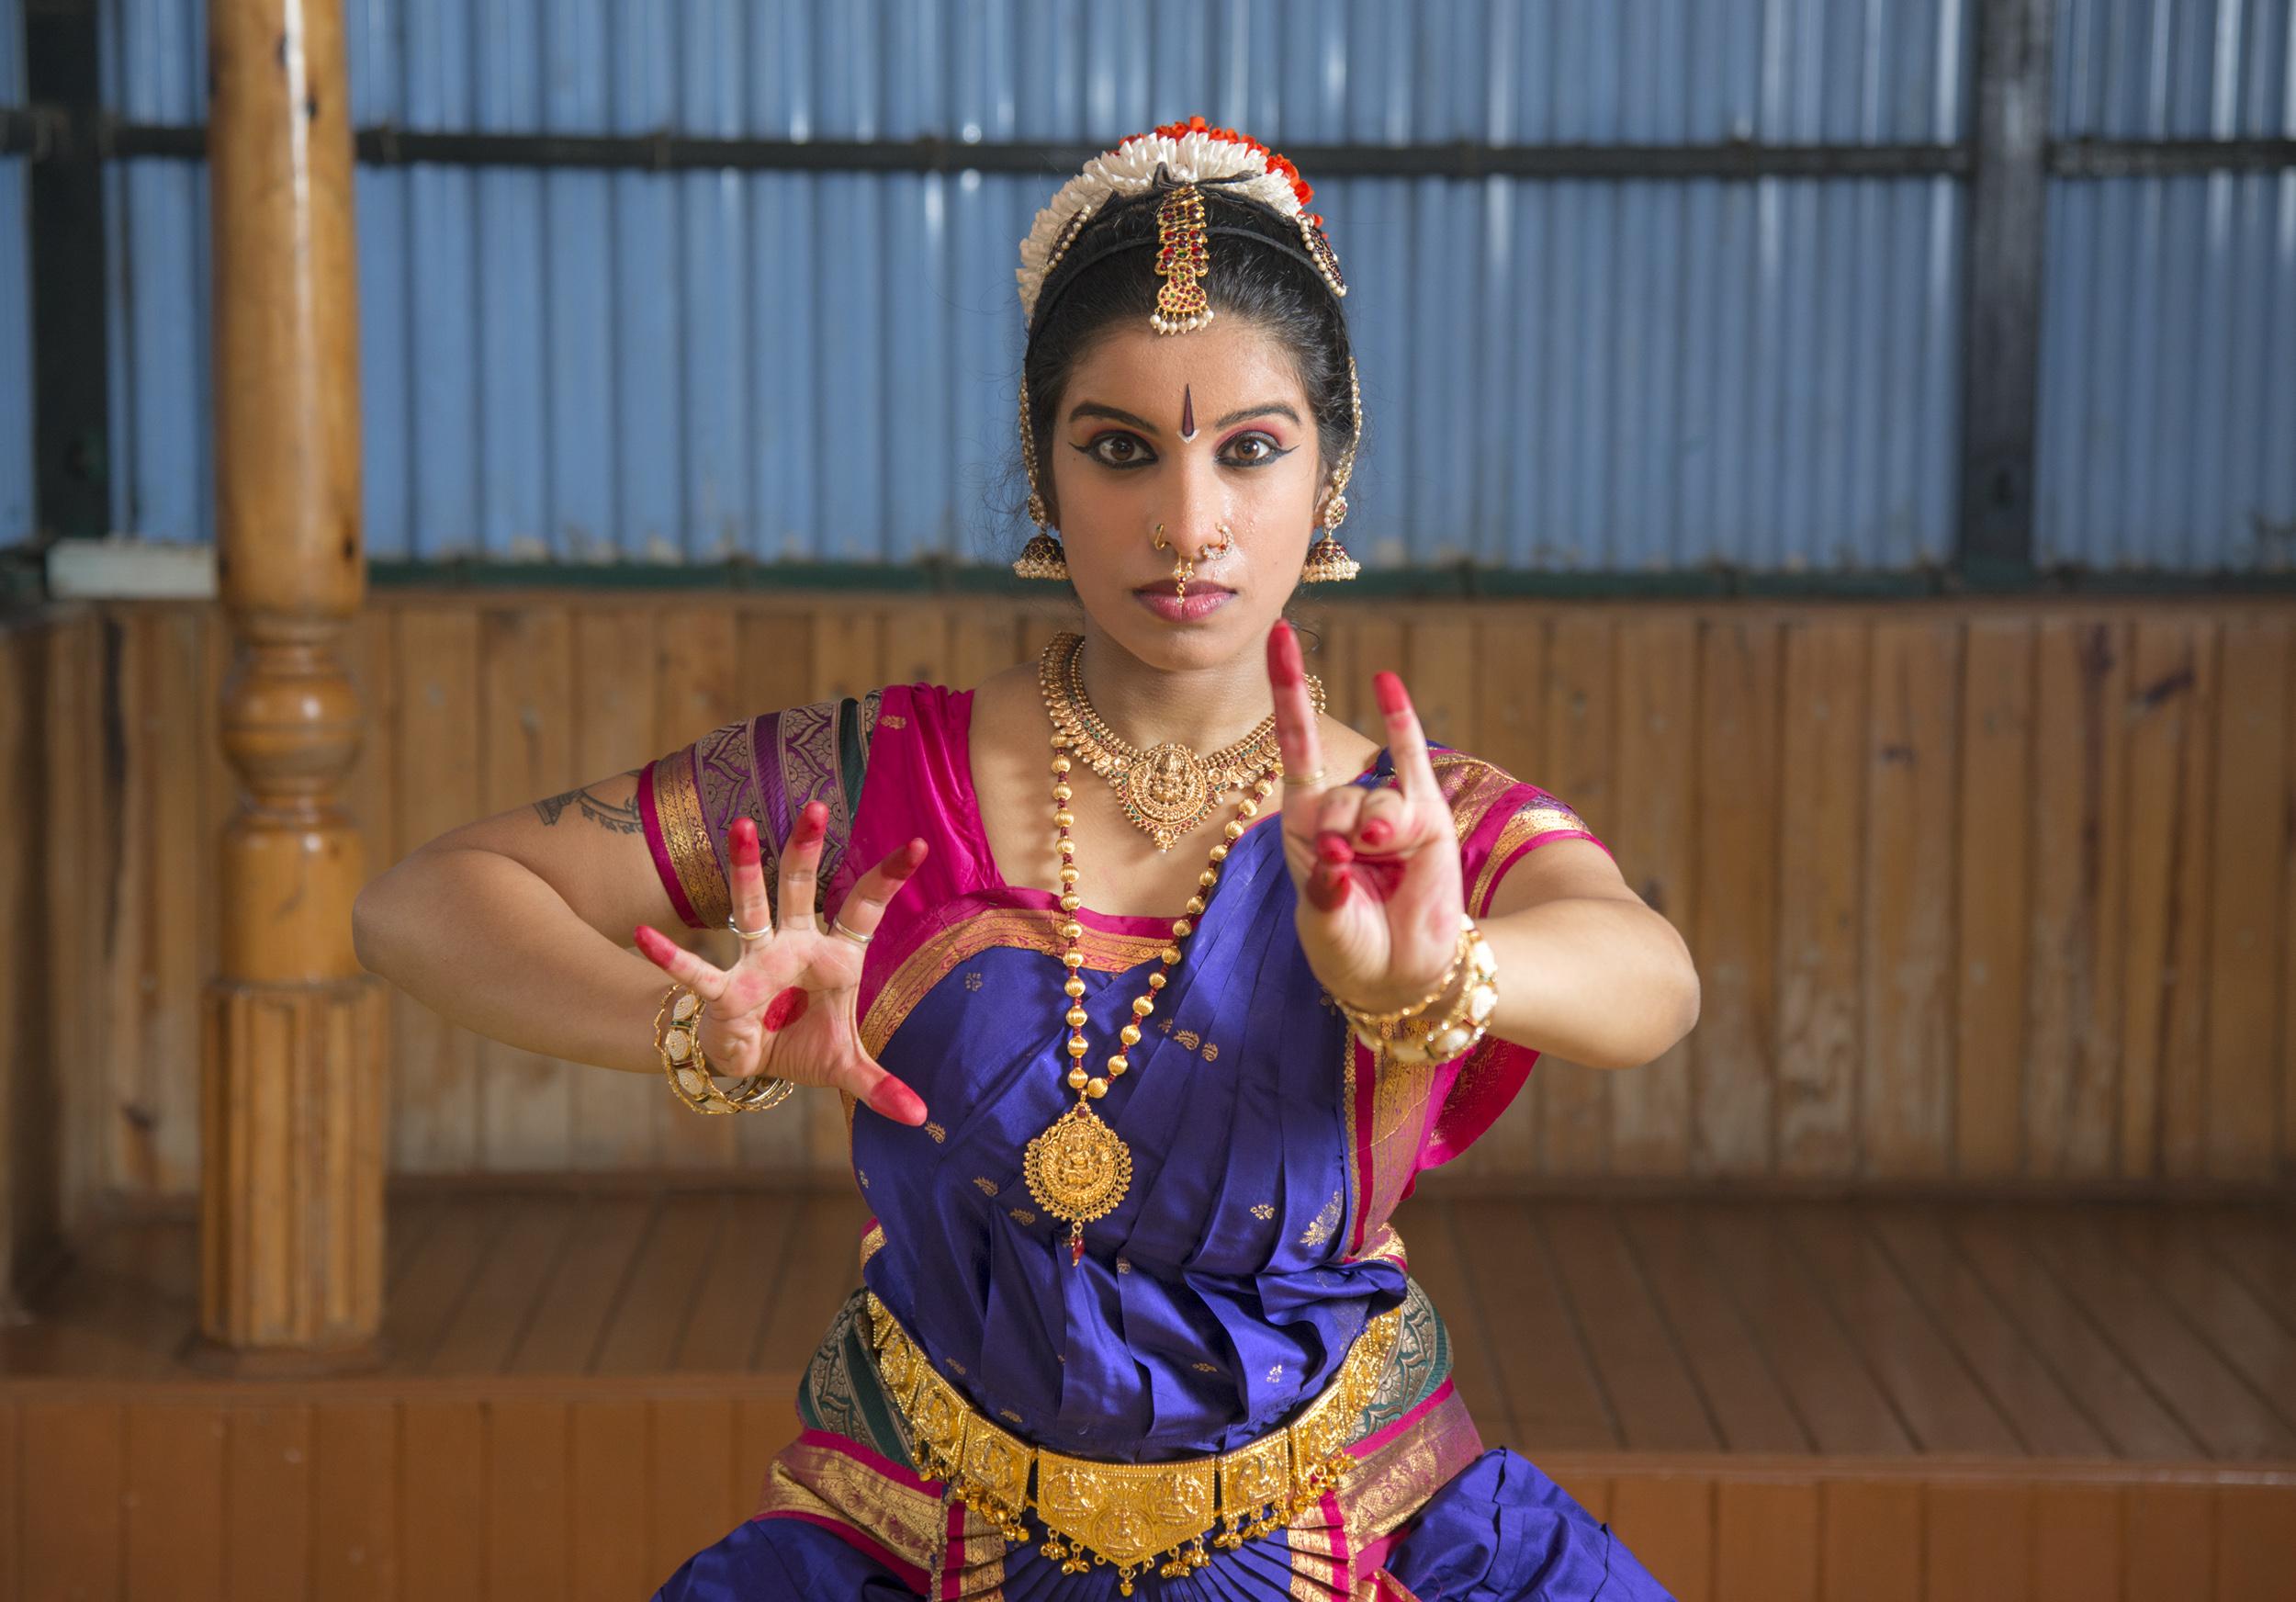 Bangalor-Nithya-0336_2500.jpg